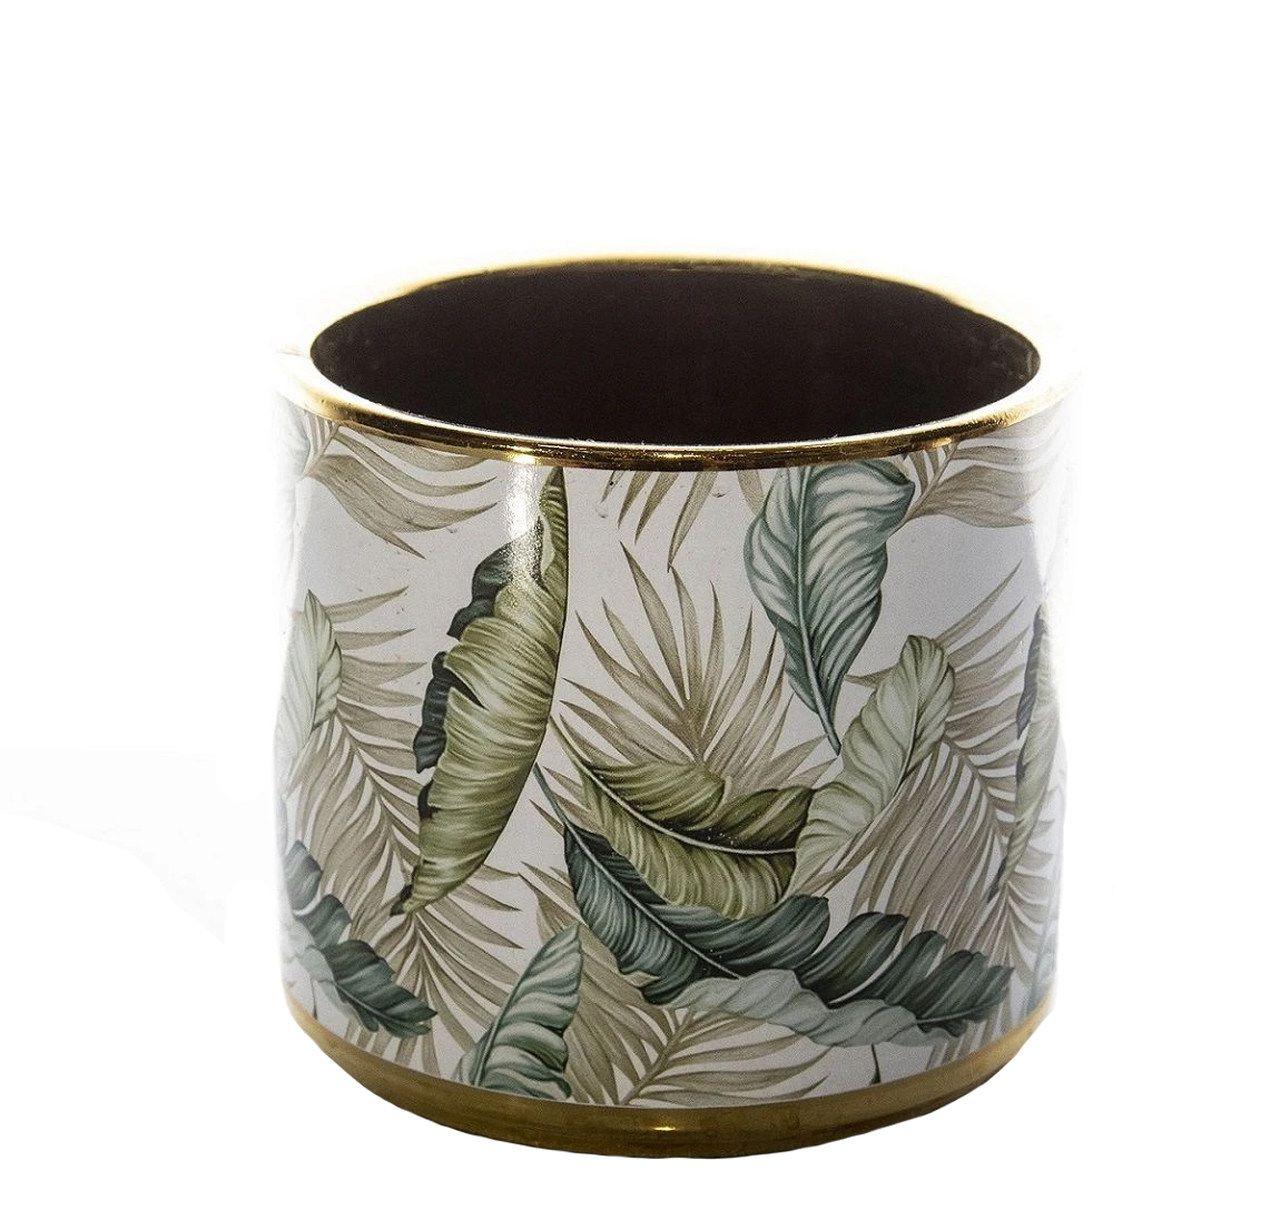 Adorno De Ceramica Vaso Para Ornamento